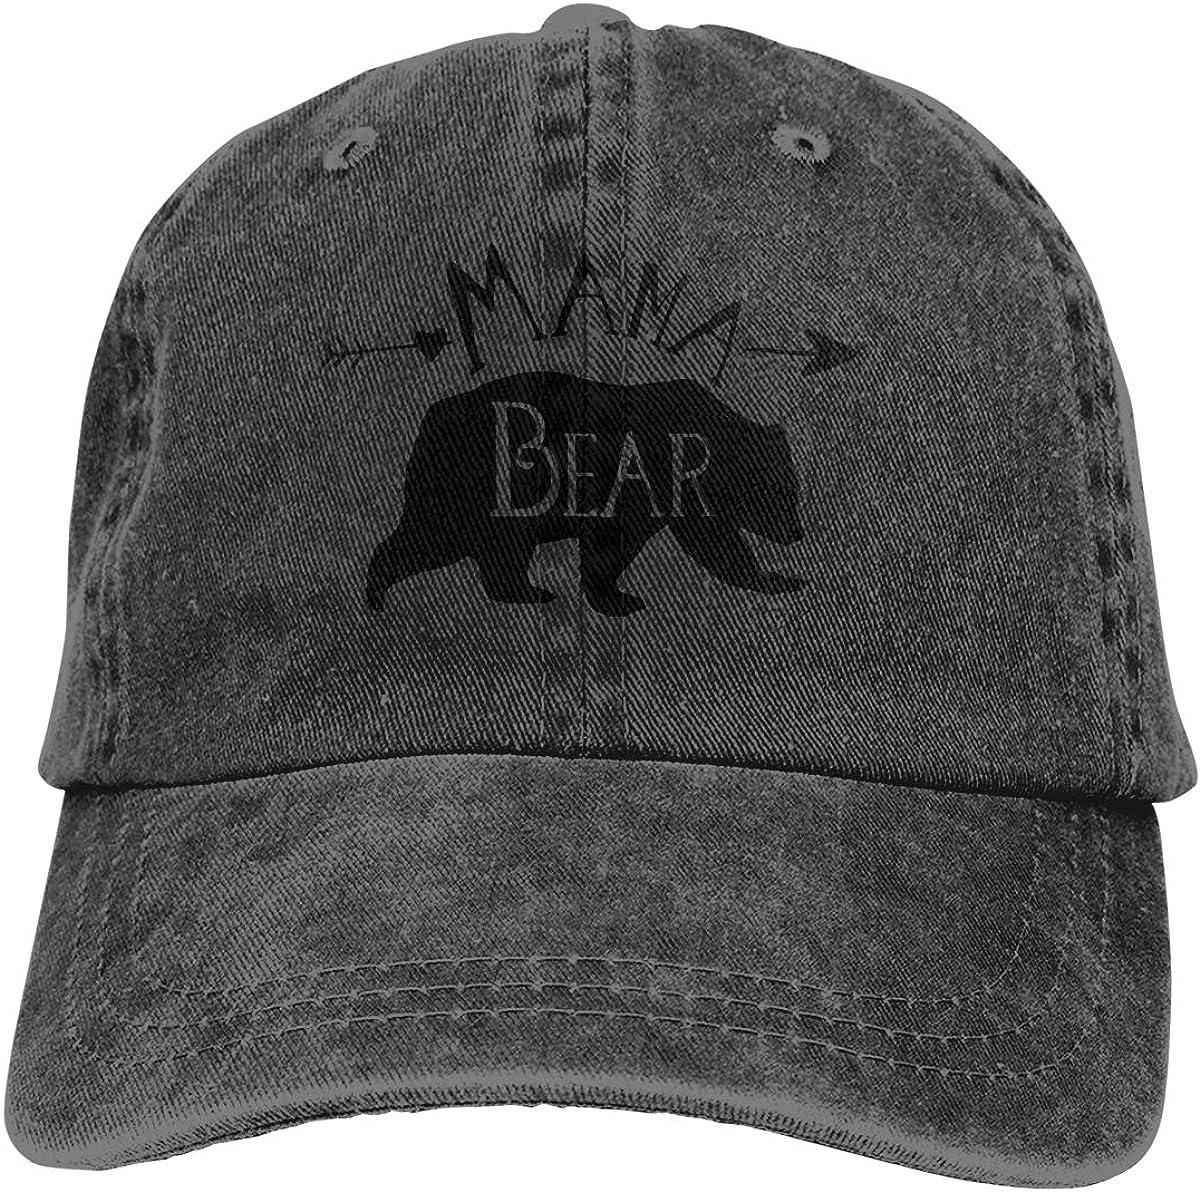 Mama Bear Adult Personalize Jeans Hip Hop Cap Adjustable Baseball Cap